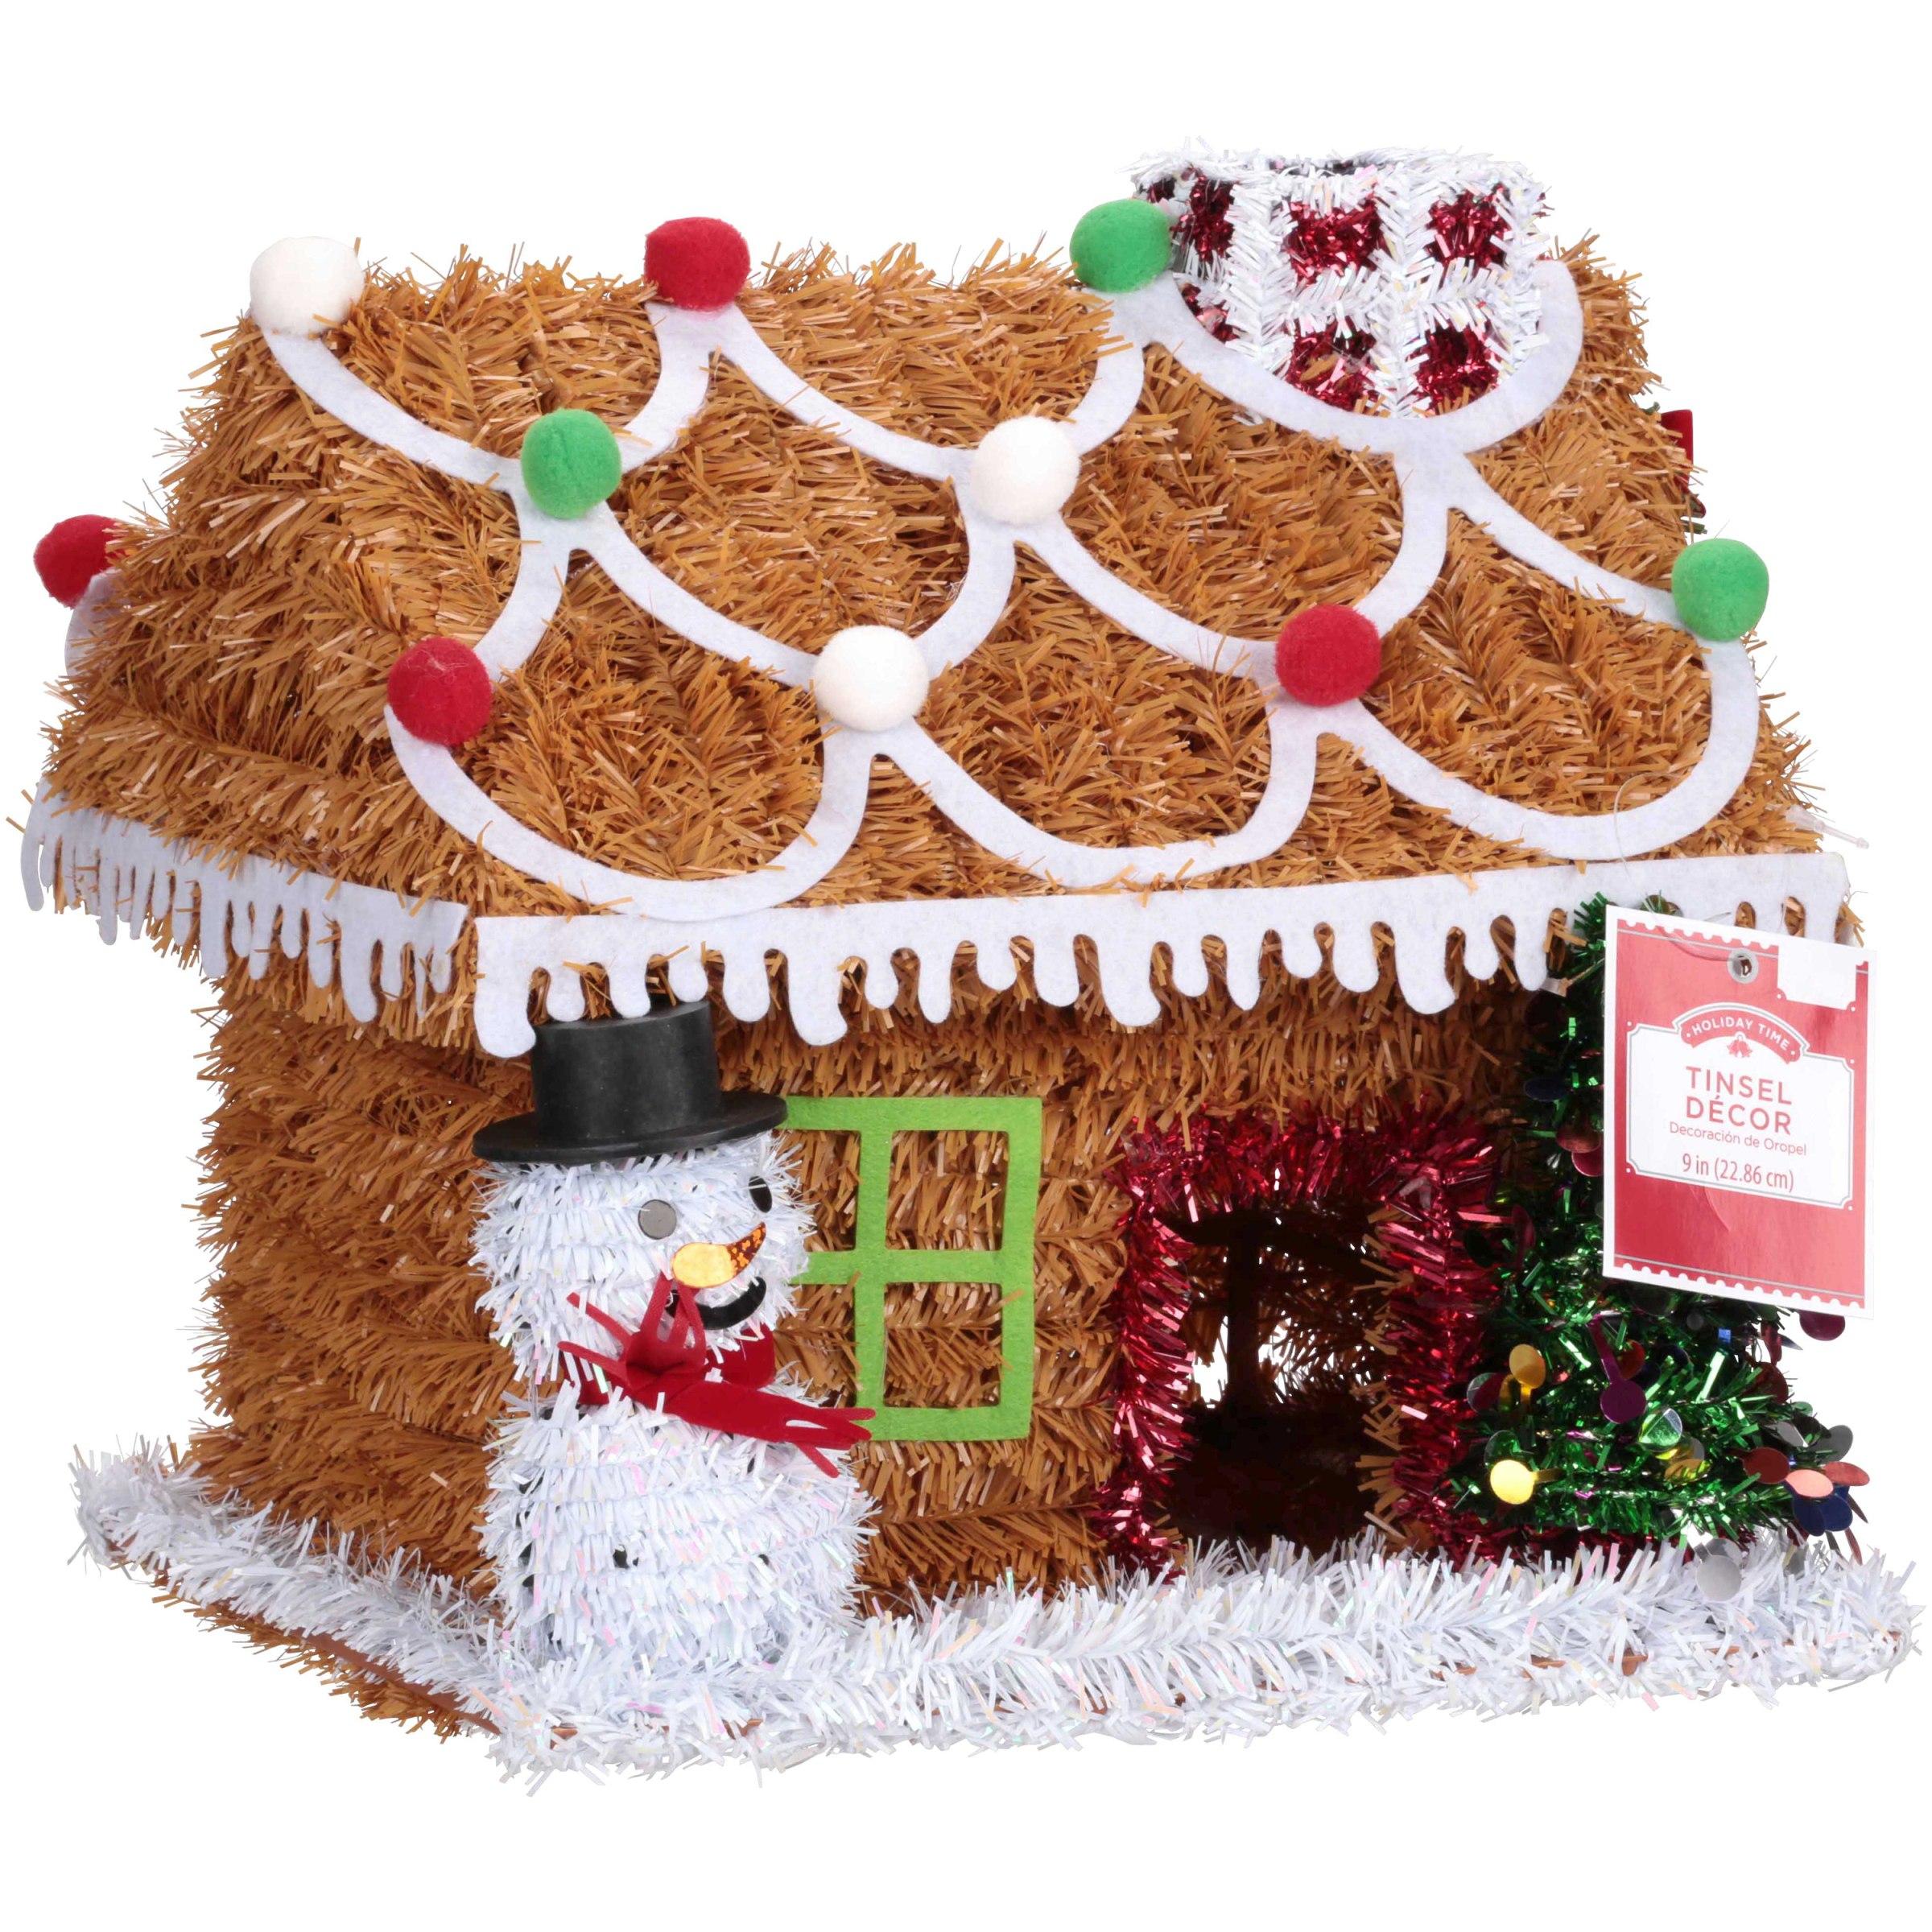 Climbing Ladder Gingerbread Decoration Design Inspiration